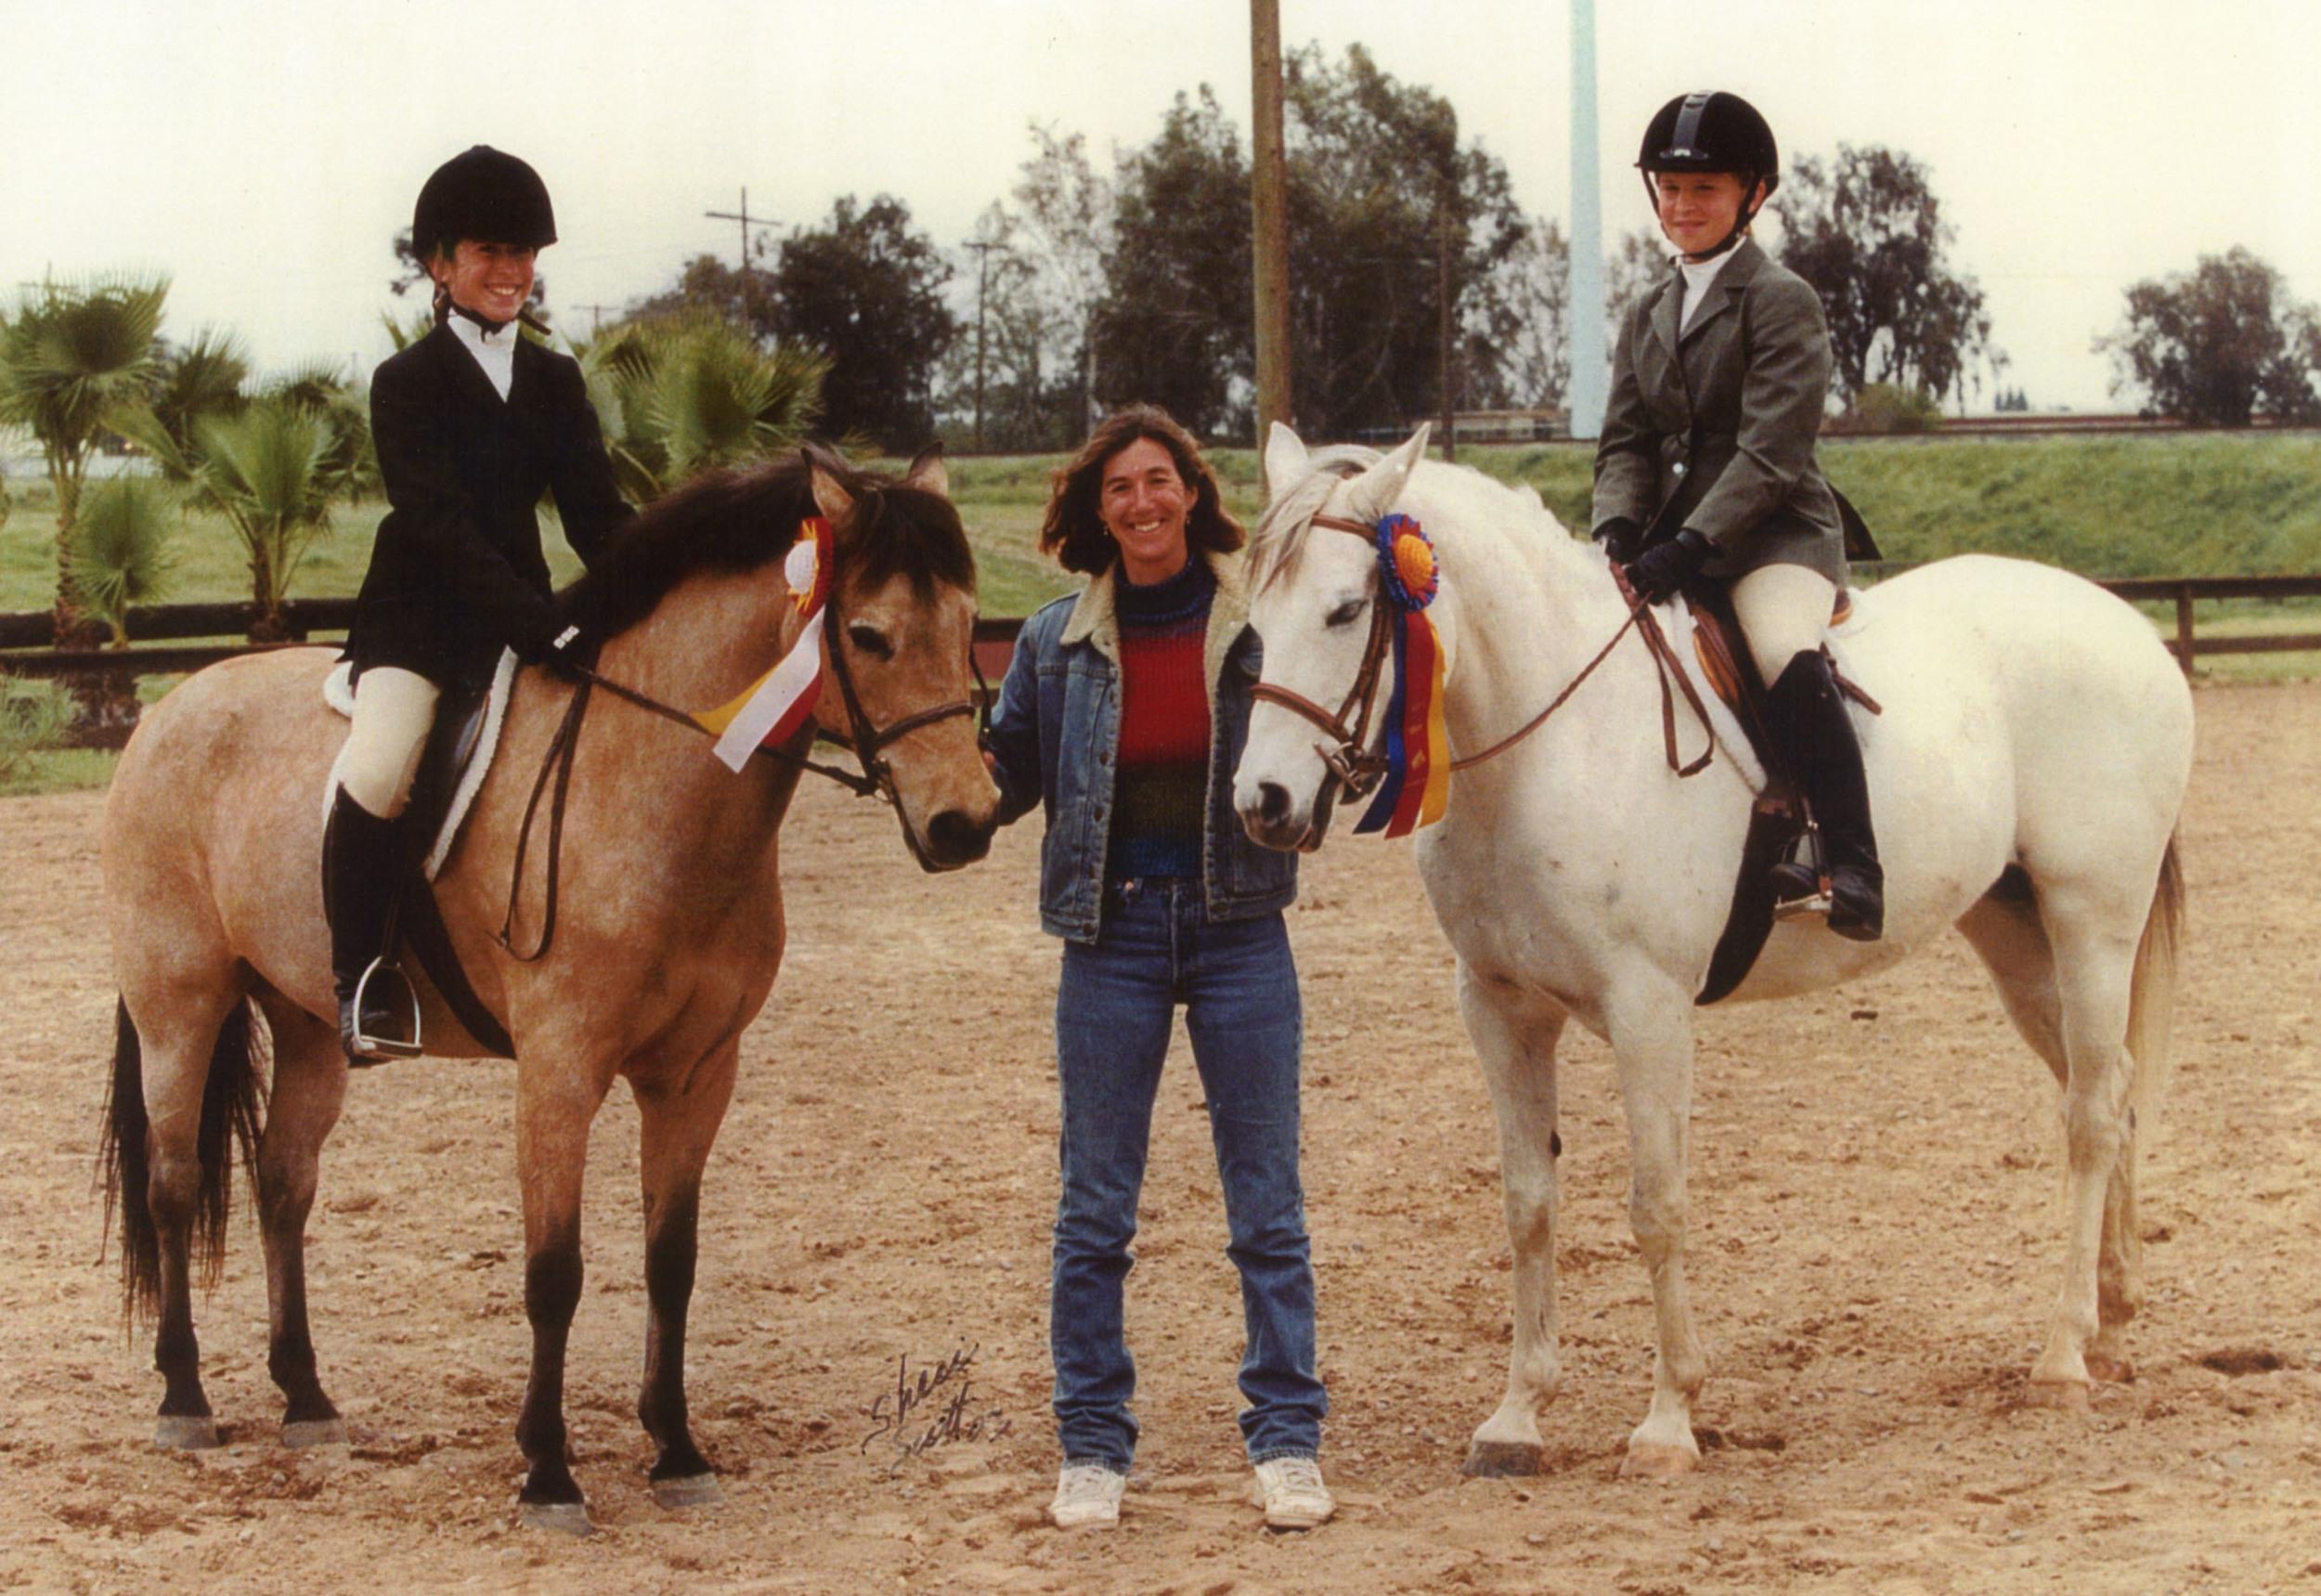 Marguerite & the ponies